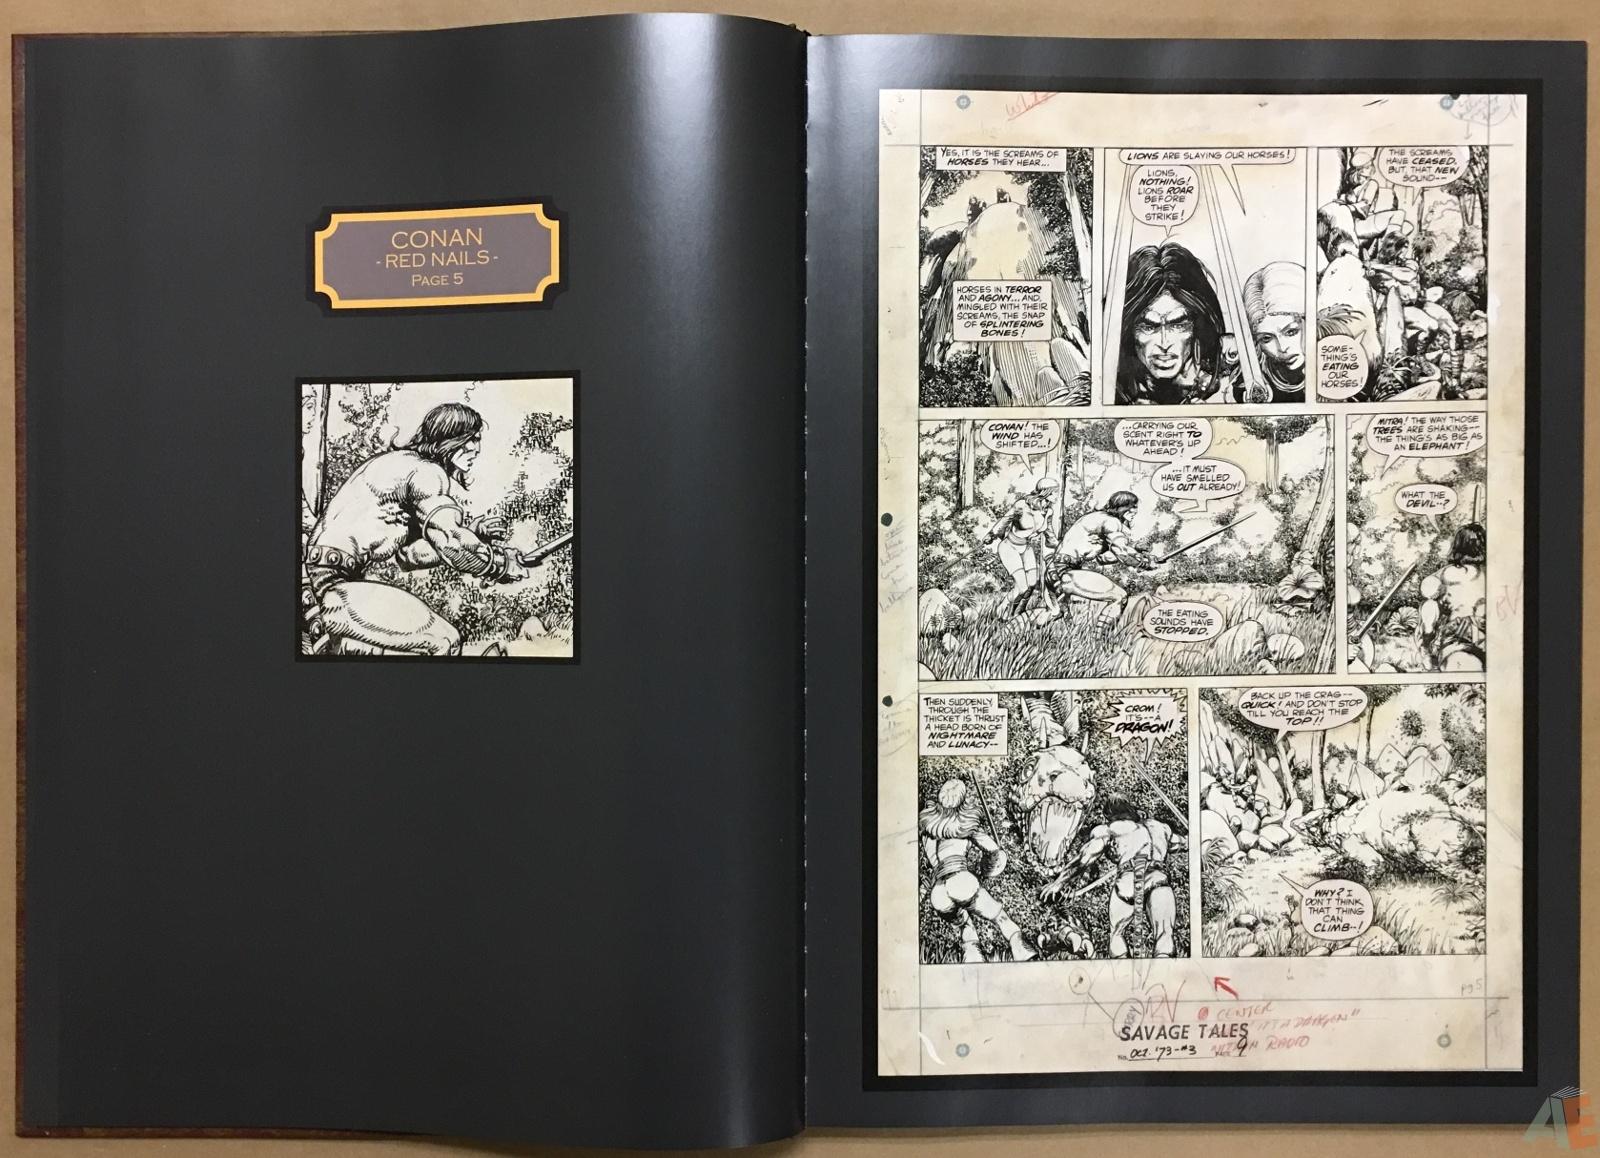 Conan: Red Nails Original Art Archives Volume 1 12